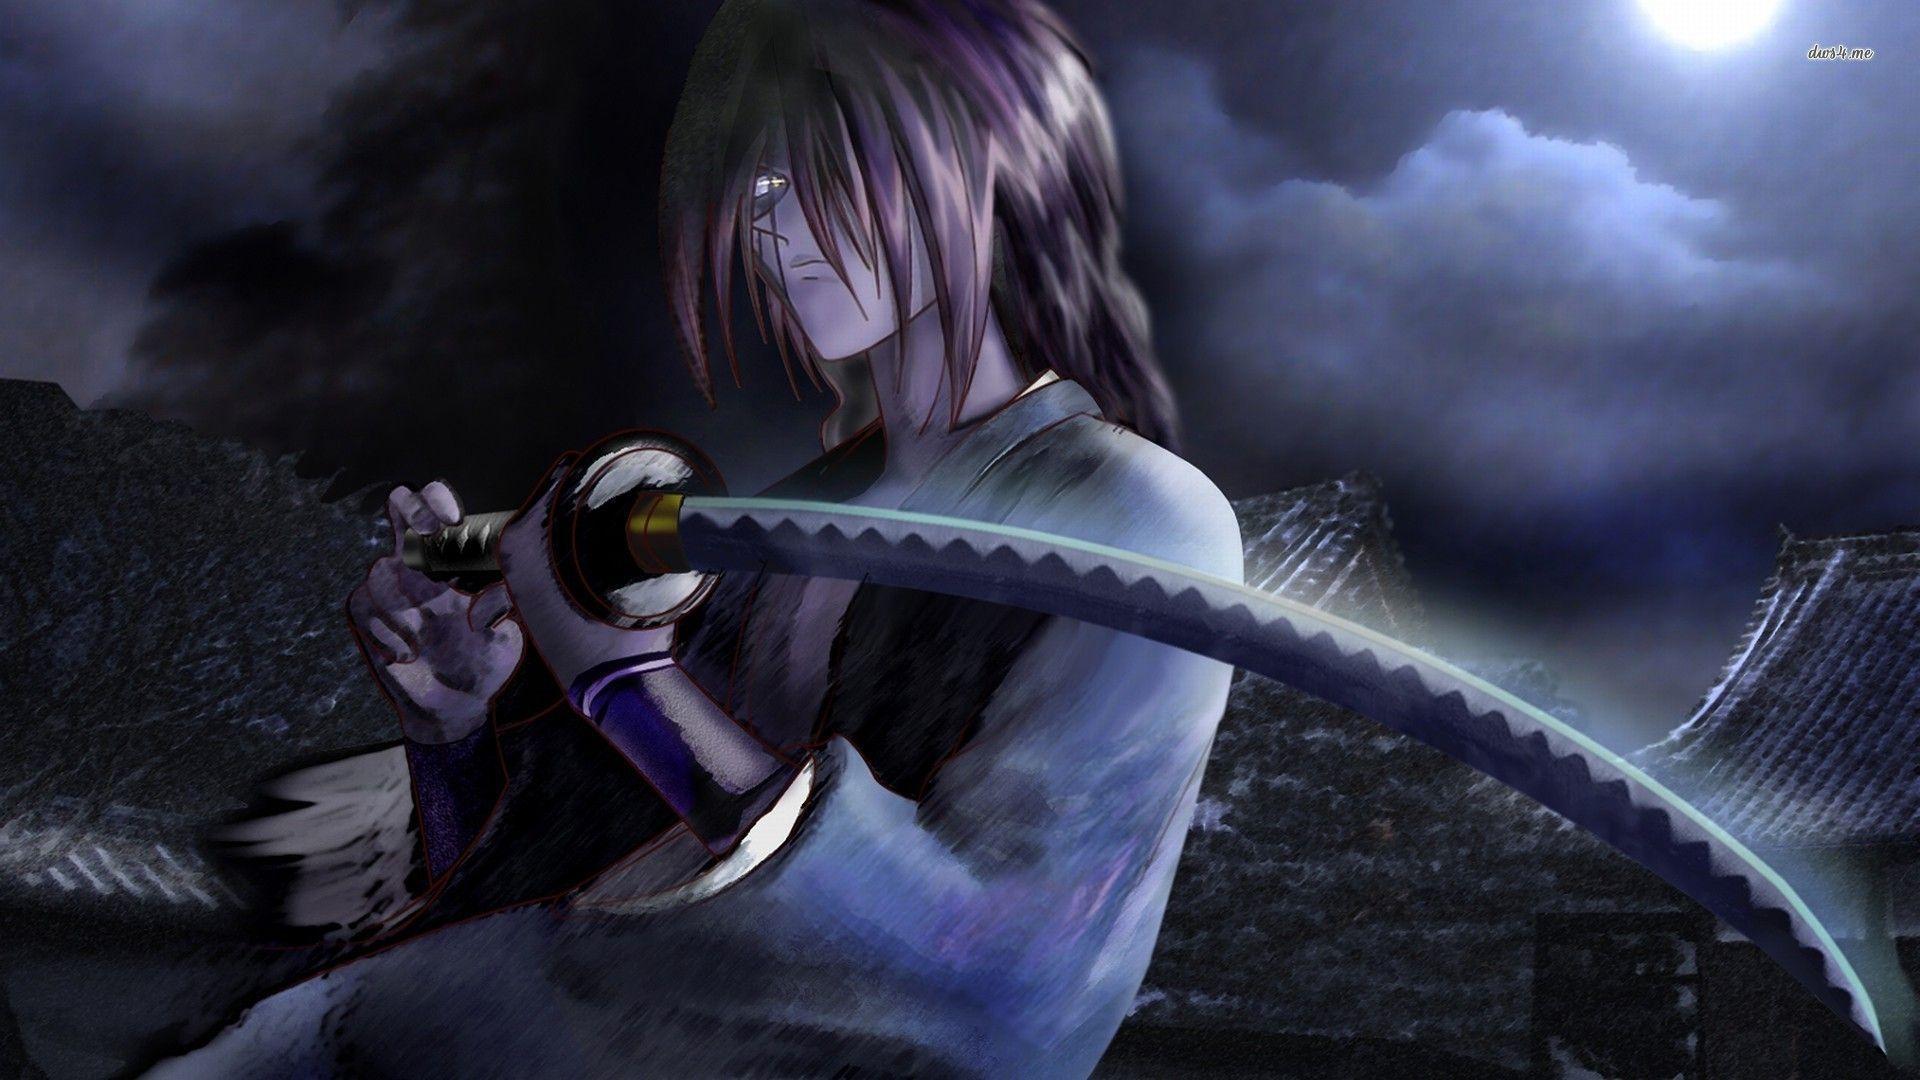 Kenshin Wallpapers - Wallpaper Cave